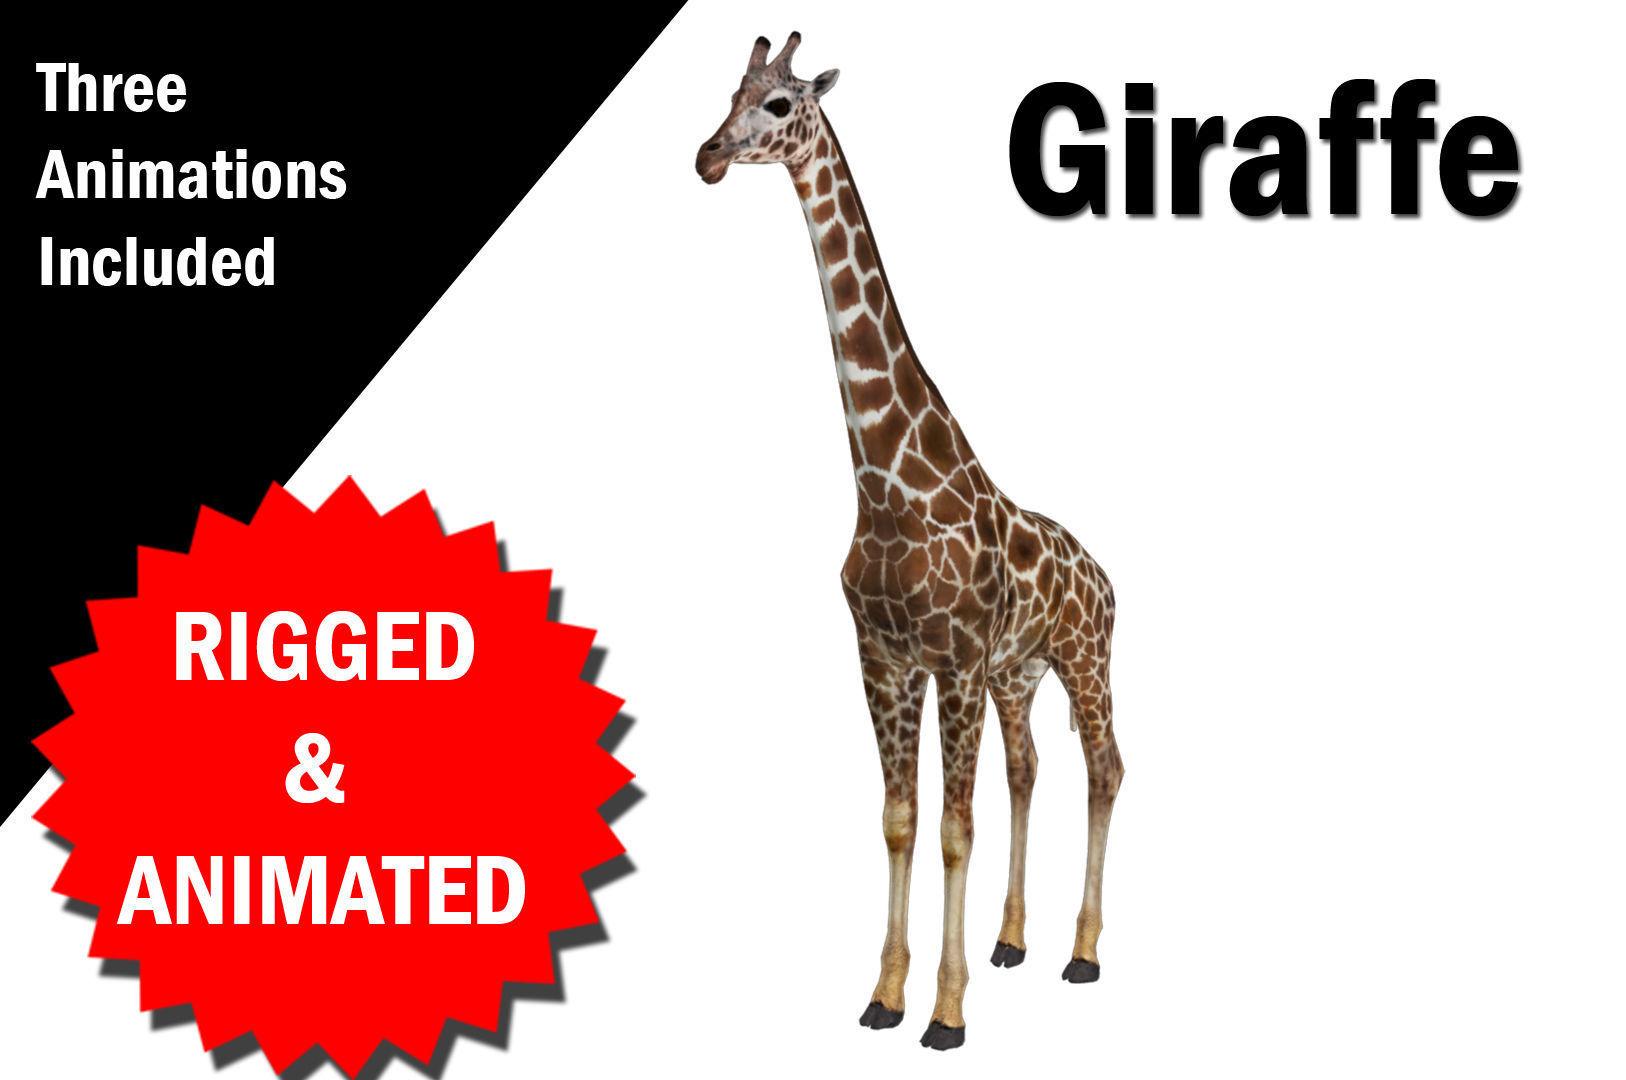 Giraffe Rigged and Animated